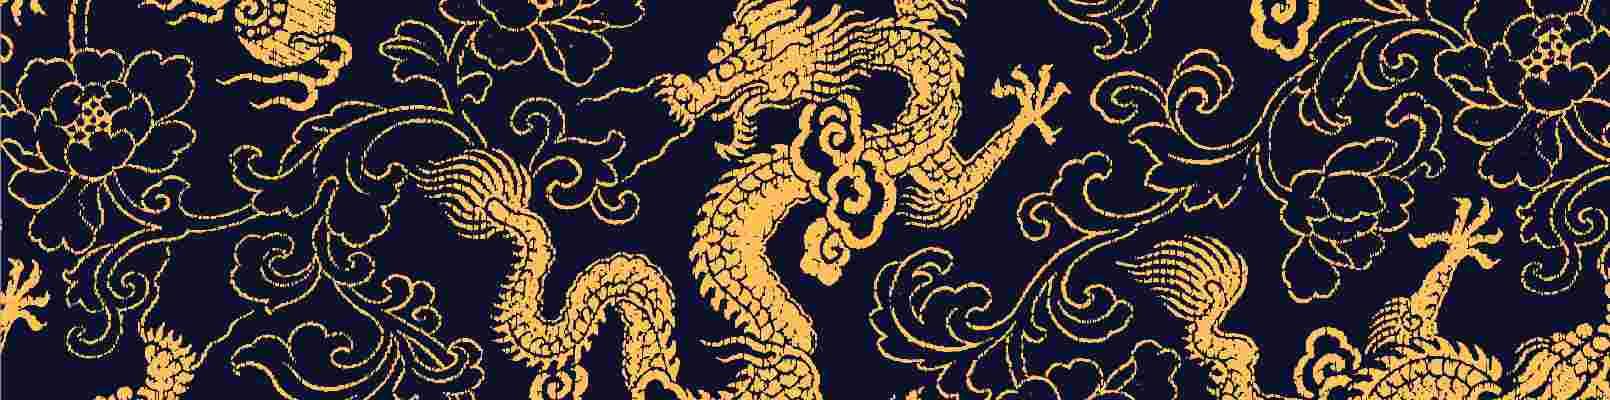 maxbet 88 ron gratis dragon